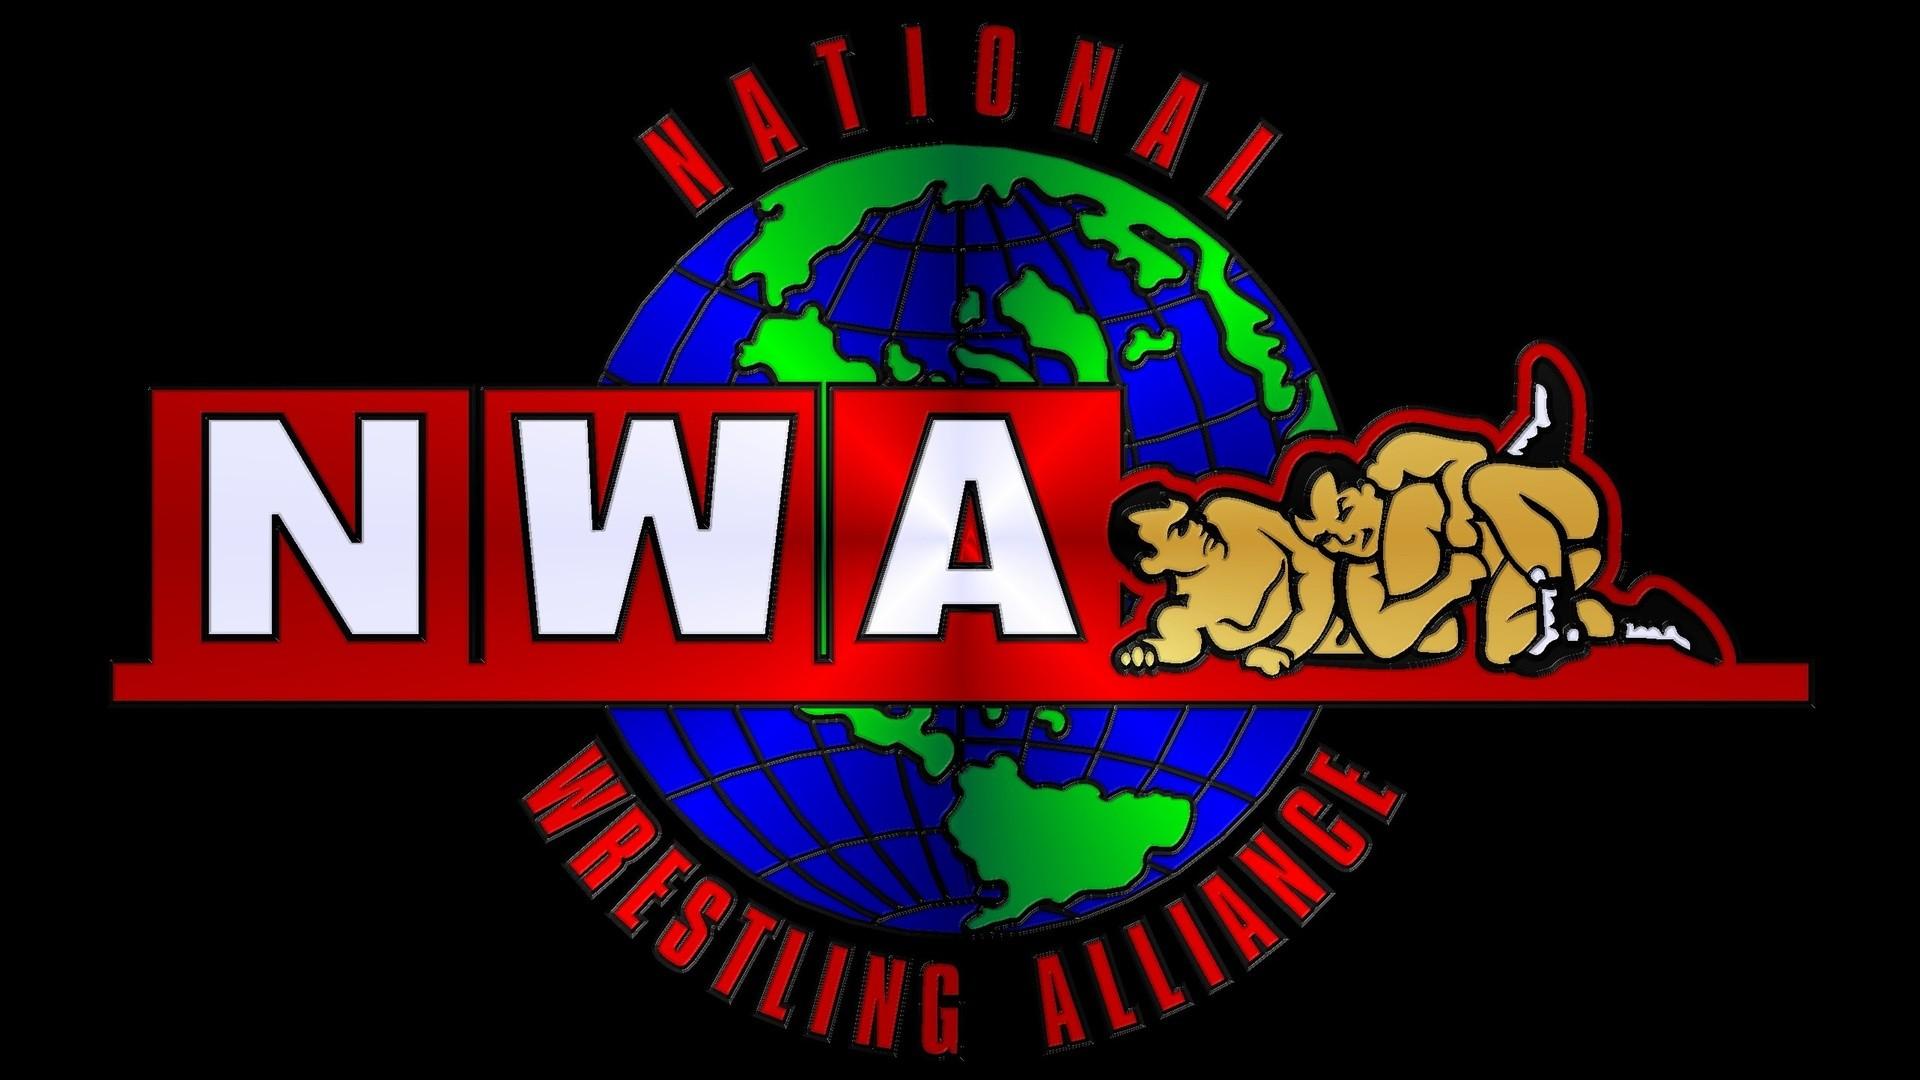 Wrestling, Wrestling Logo, Nwa Logo, Nwa, National Wrestling Alliance